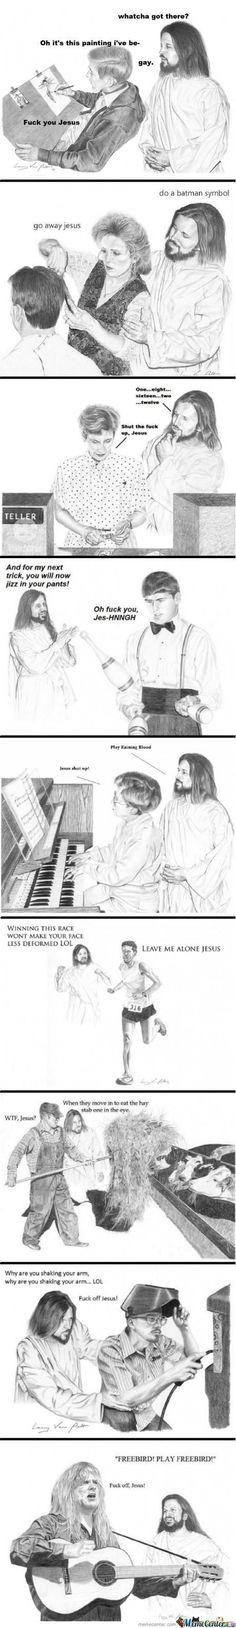 Annoying Jesus